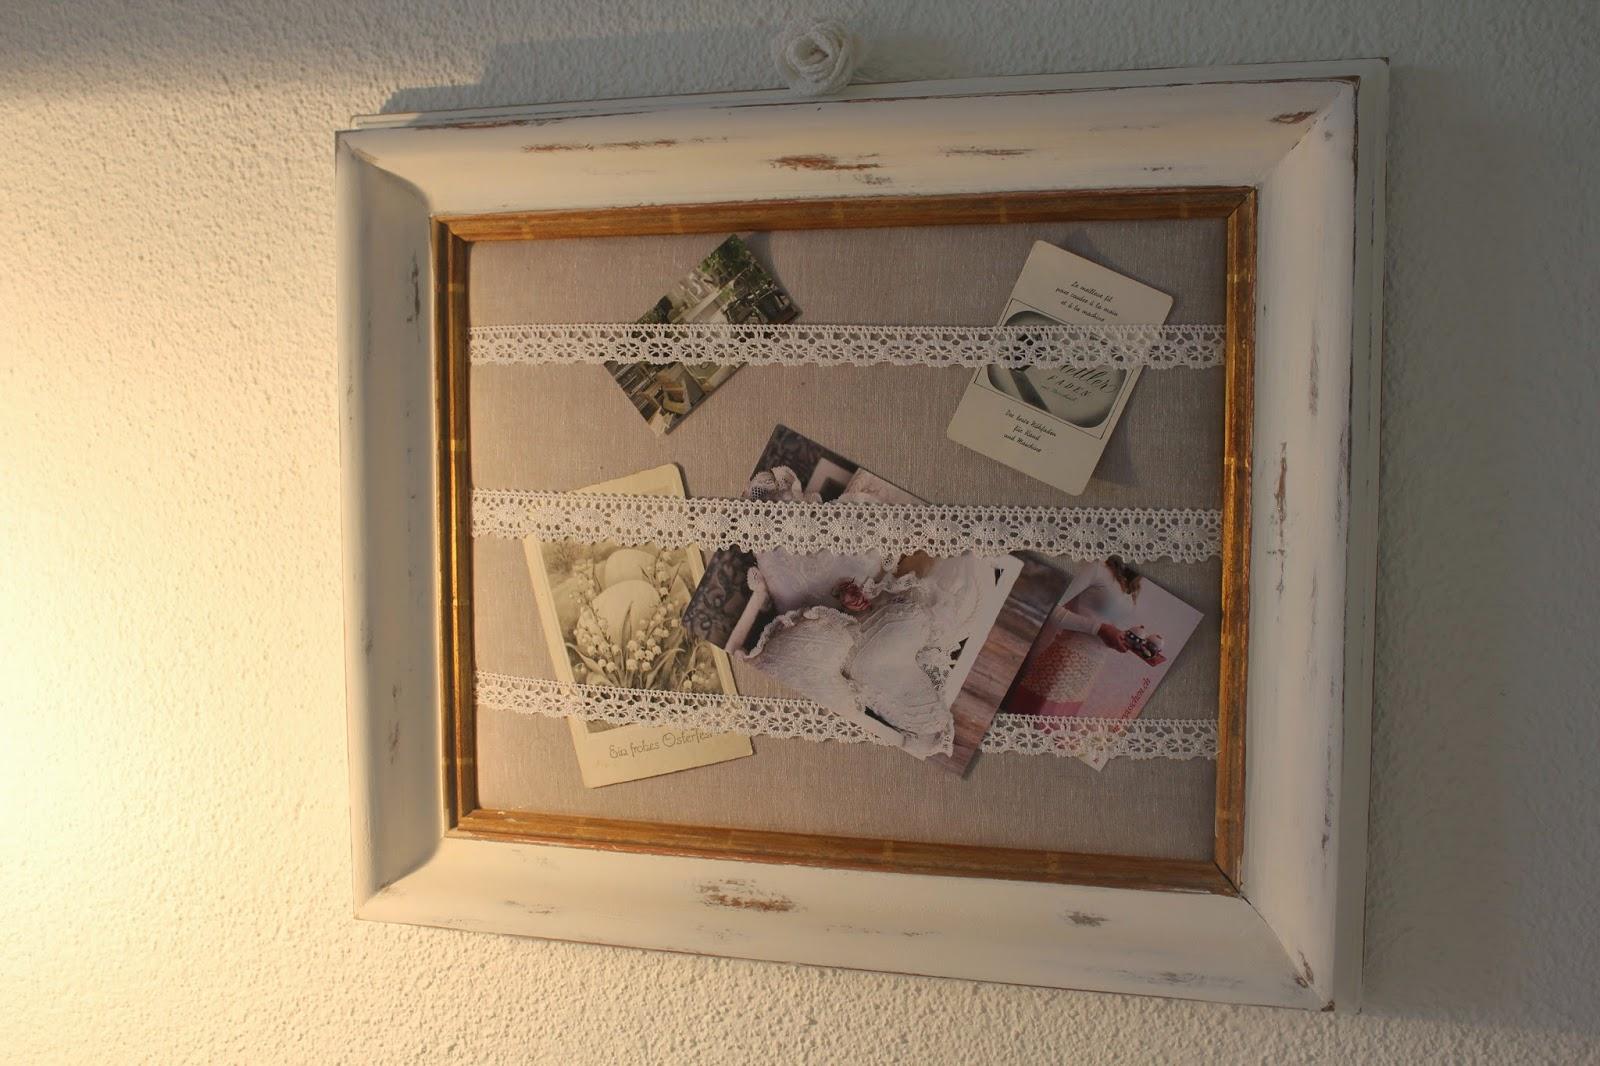 Gemütlich Wo Alten Bilderrahmen Kaufen Fotos - Bilderrahmen Ideen ...